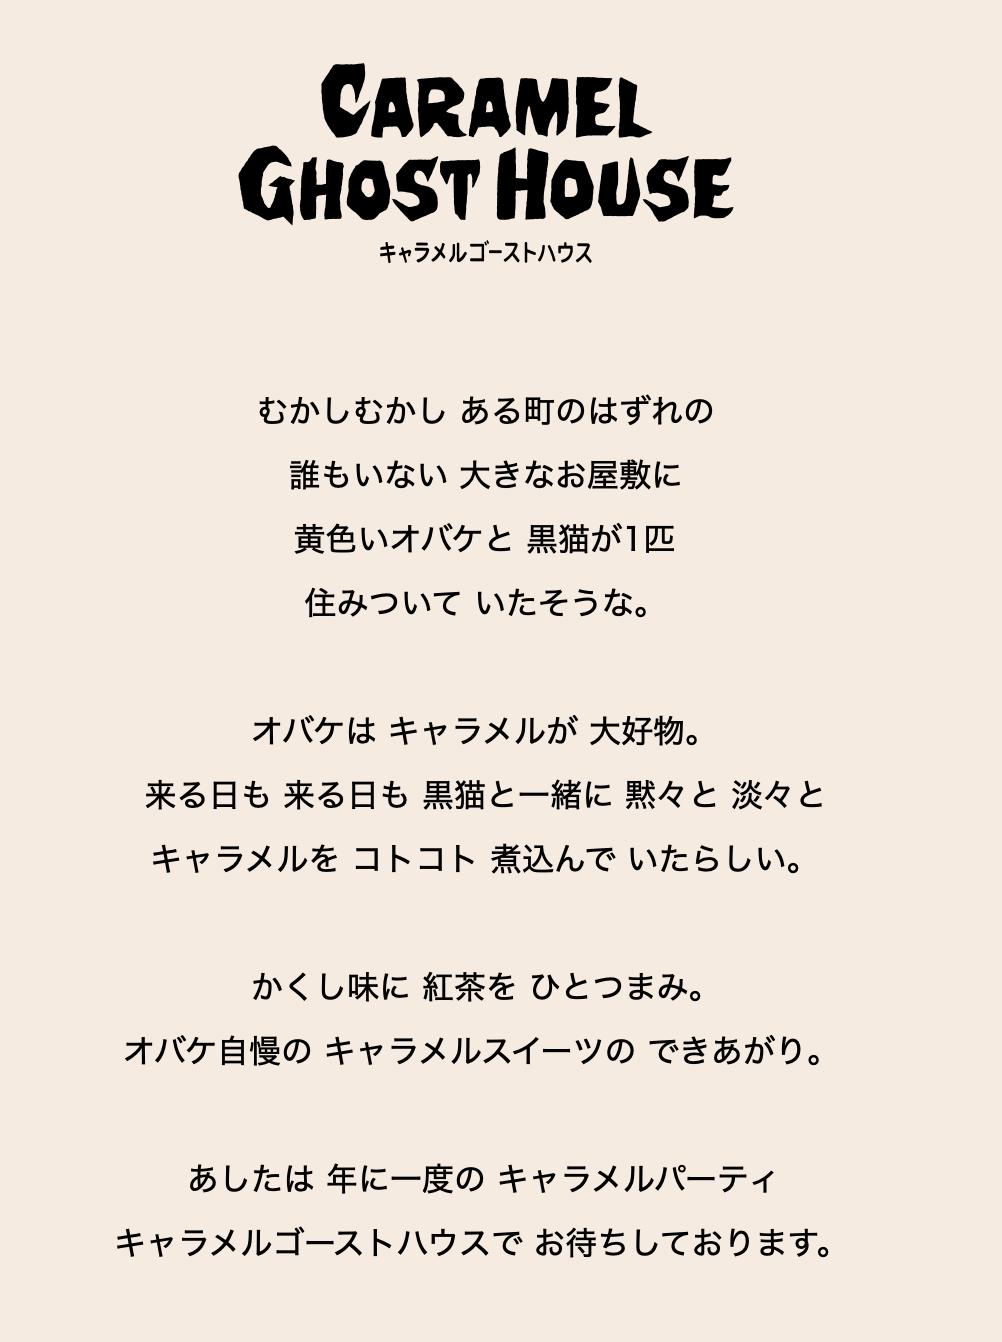 caramelghosthouse